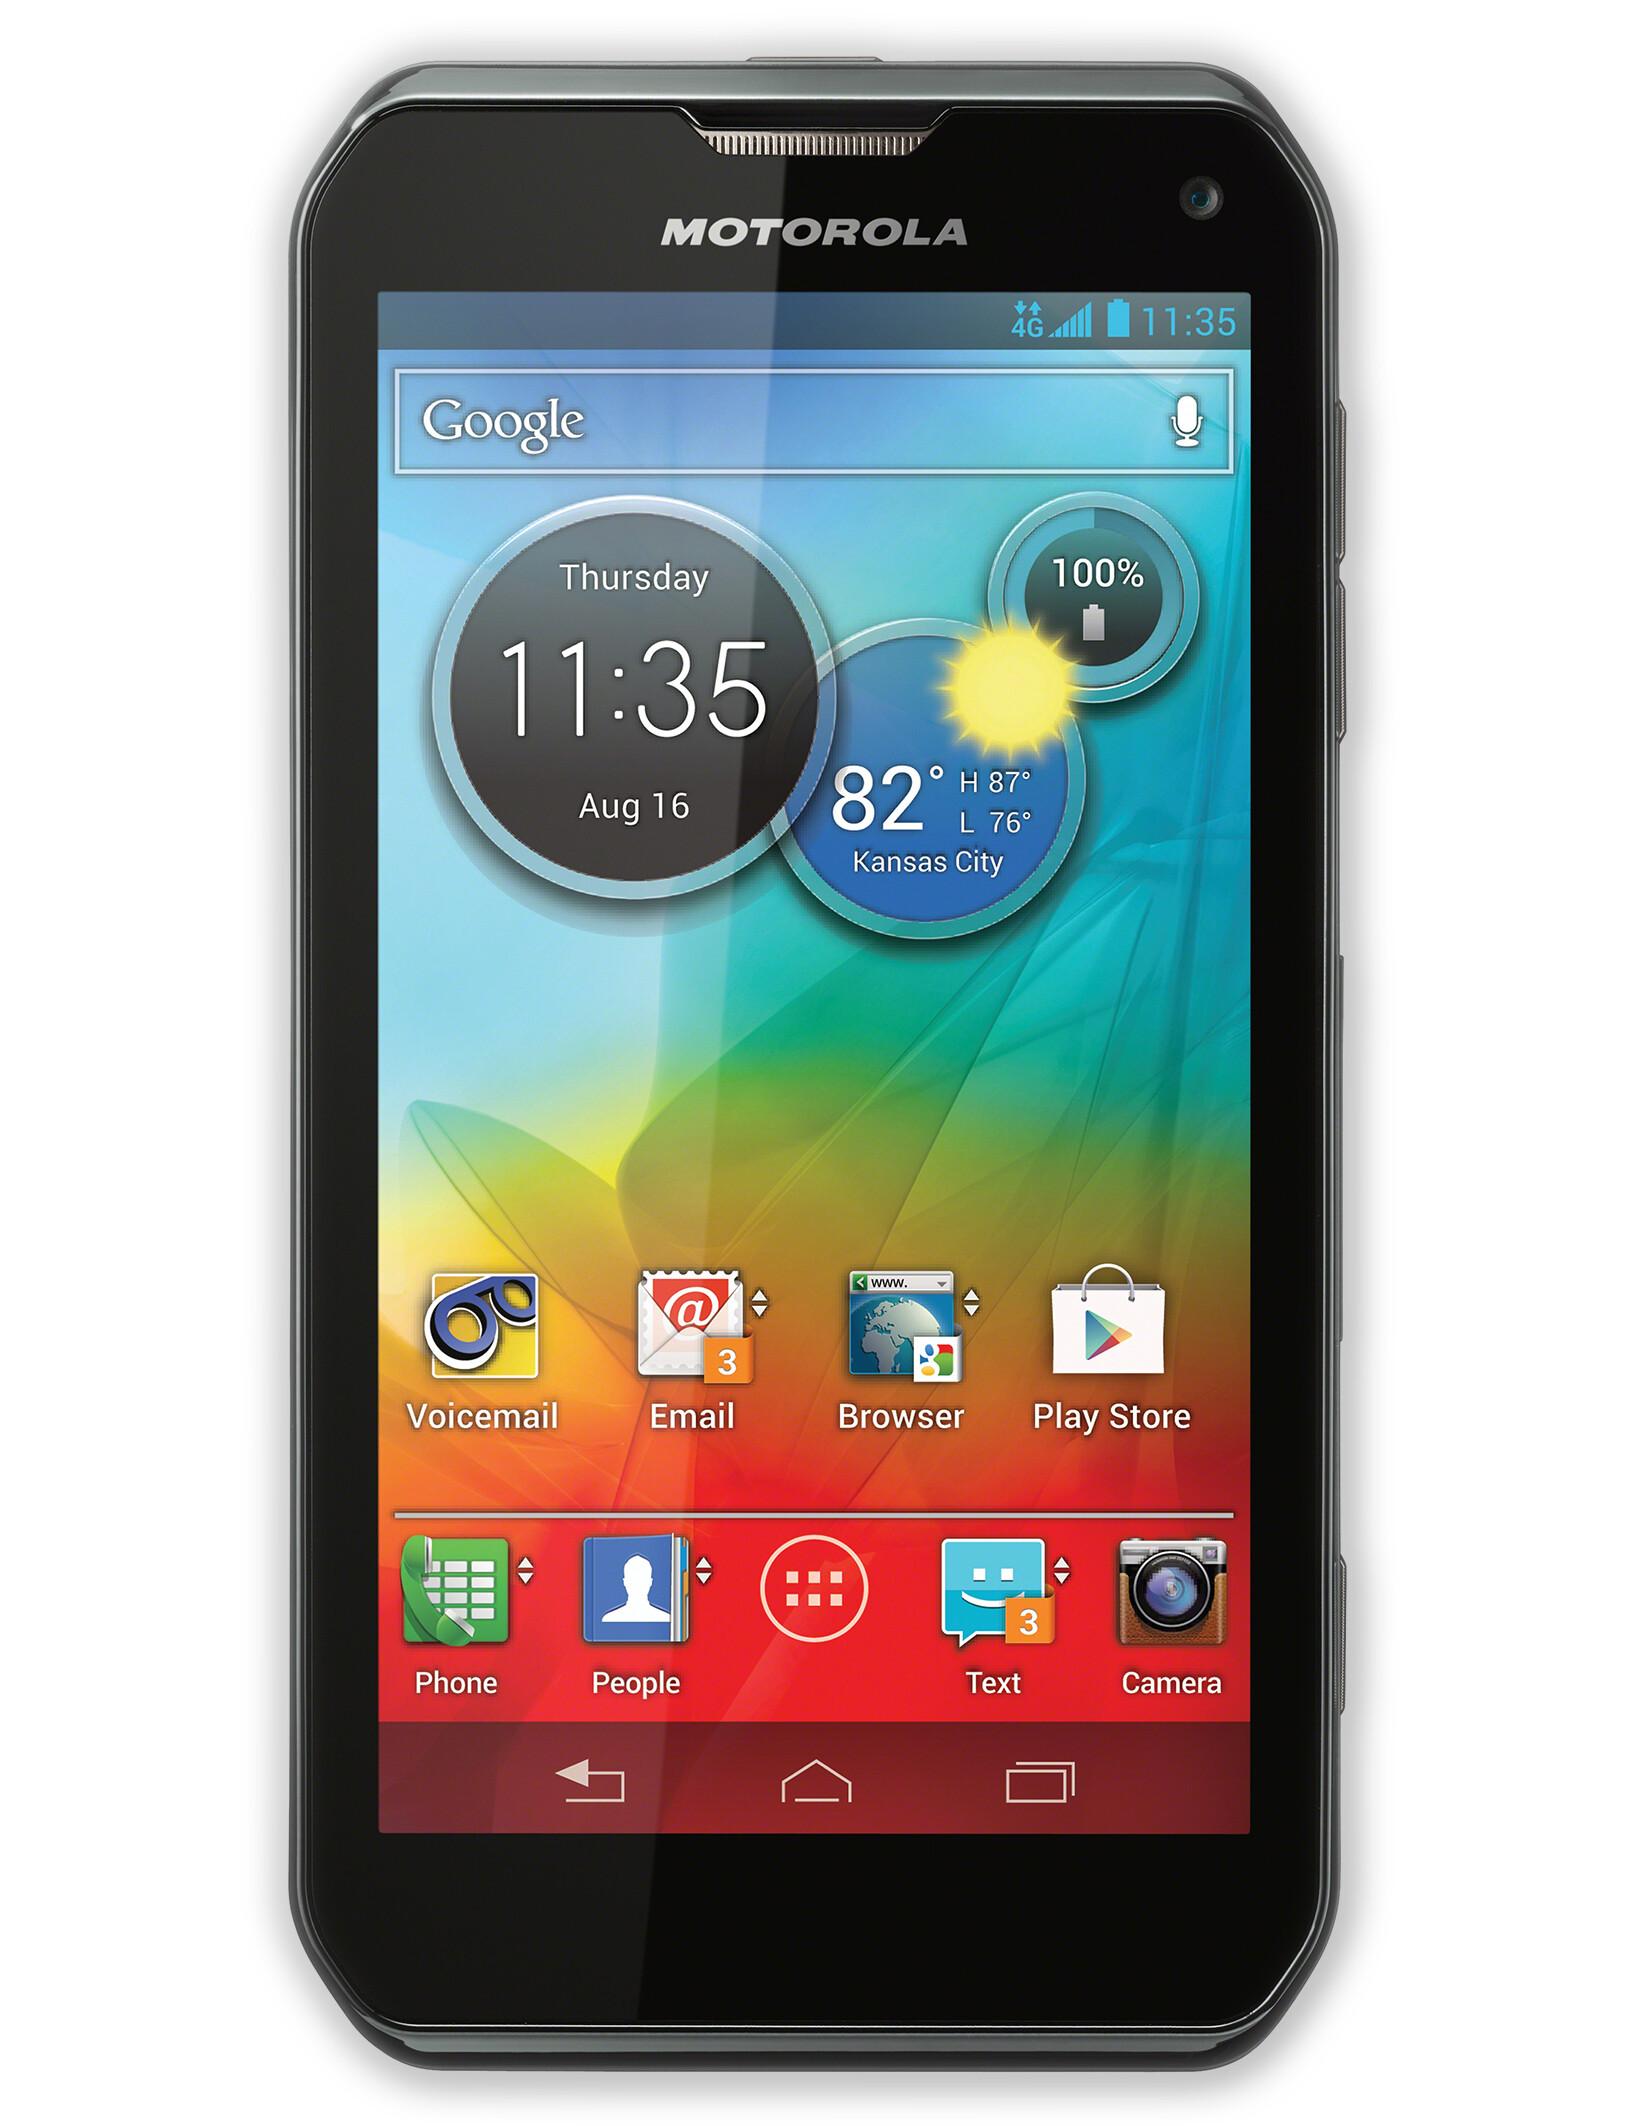 motorola photon q 4g lte photos rh phonearena com Motorola Photon 4G Cell Phone Motorola Photon 4G User Manual